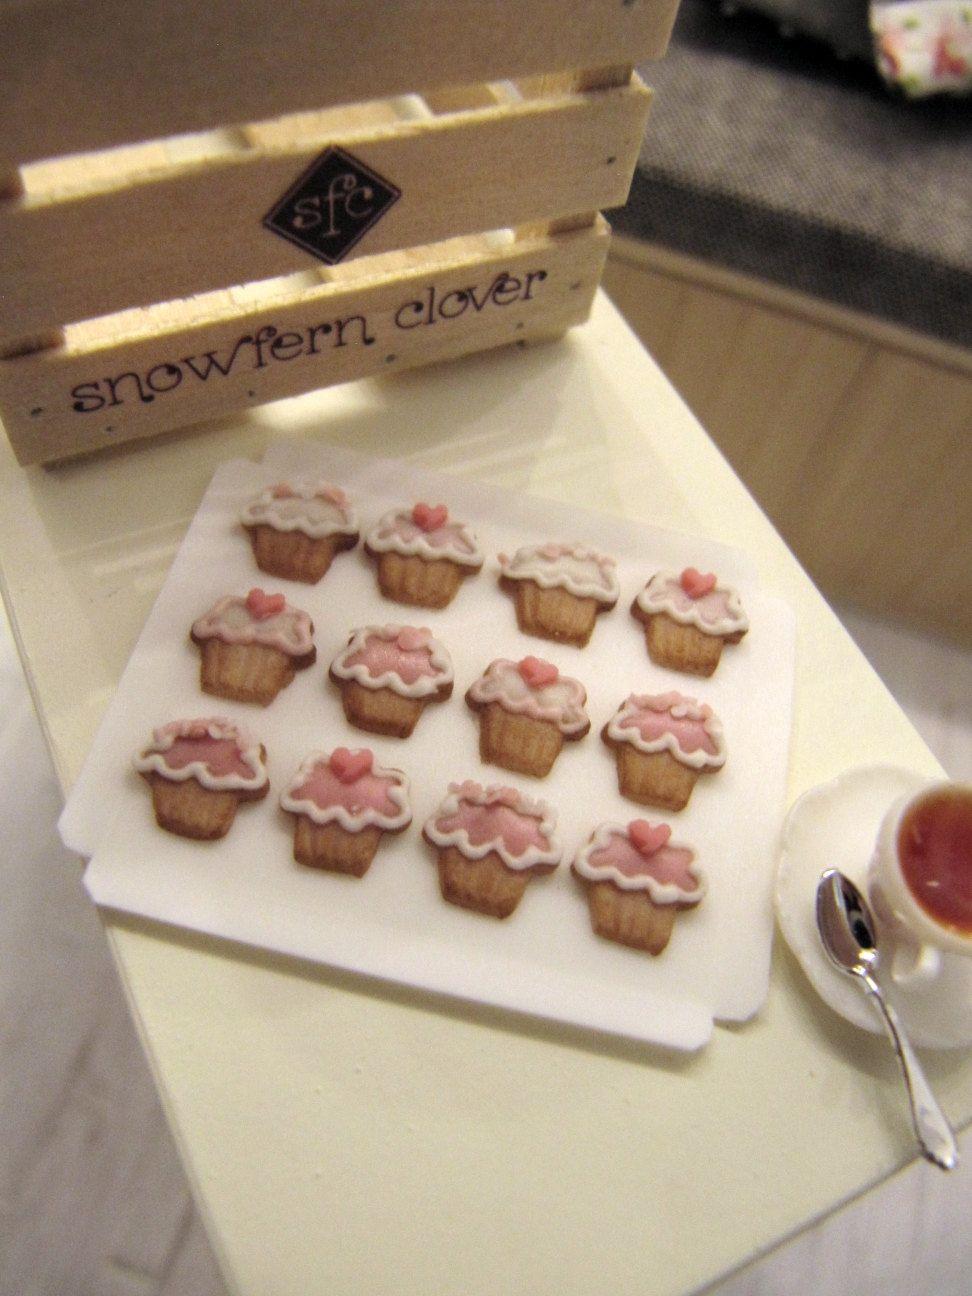 Miniature Cookies - Cupcake Designs - 12 pcs - 1/12 Scale Dollhouse Miniature. $42.00, via Etsy.